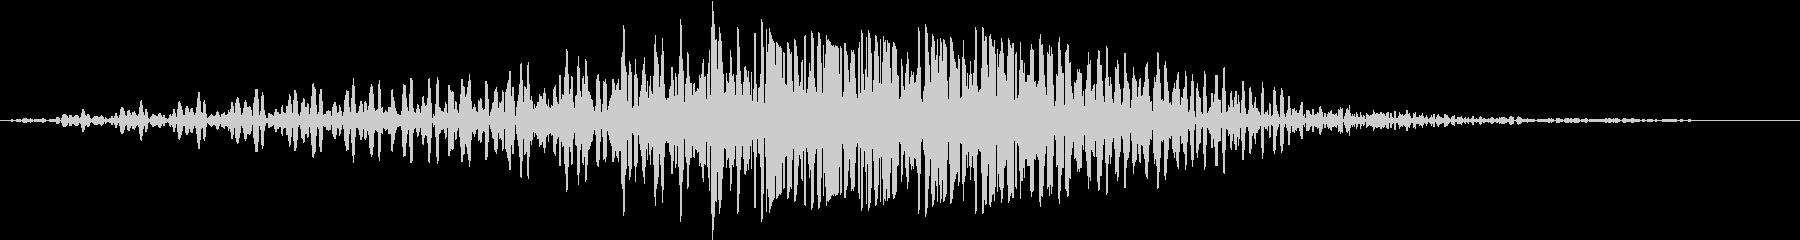 SF通過音02-03の未再生の波形